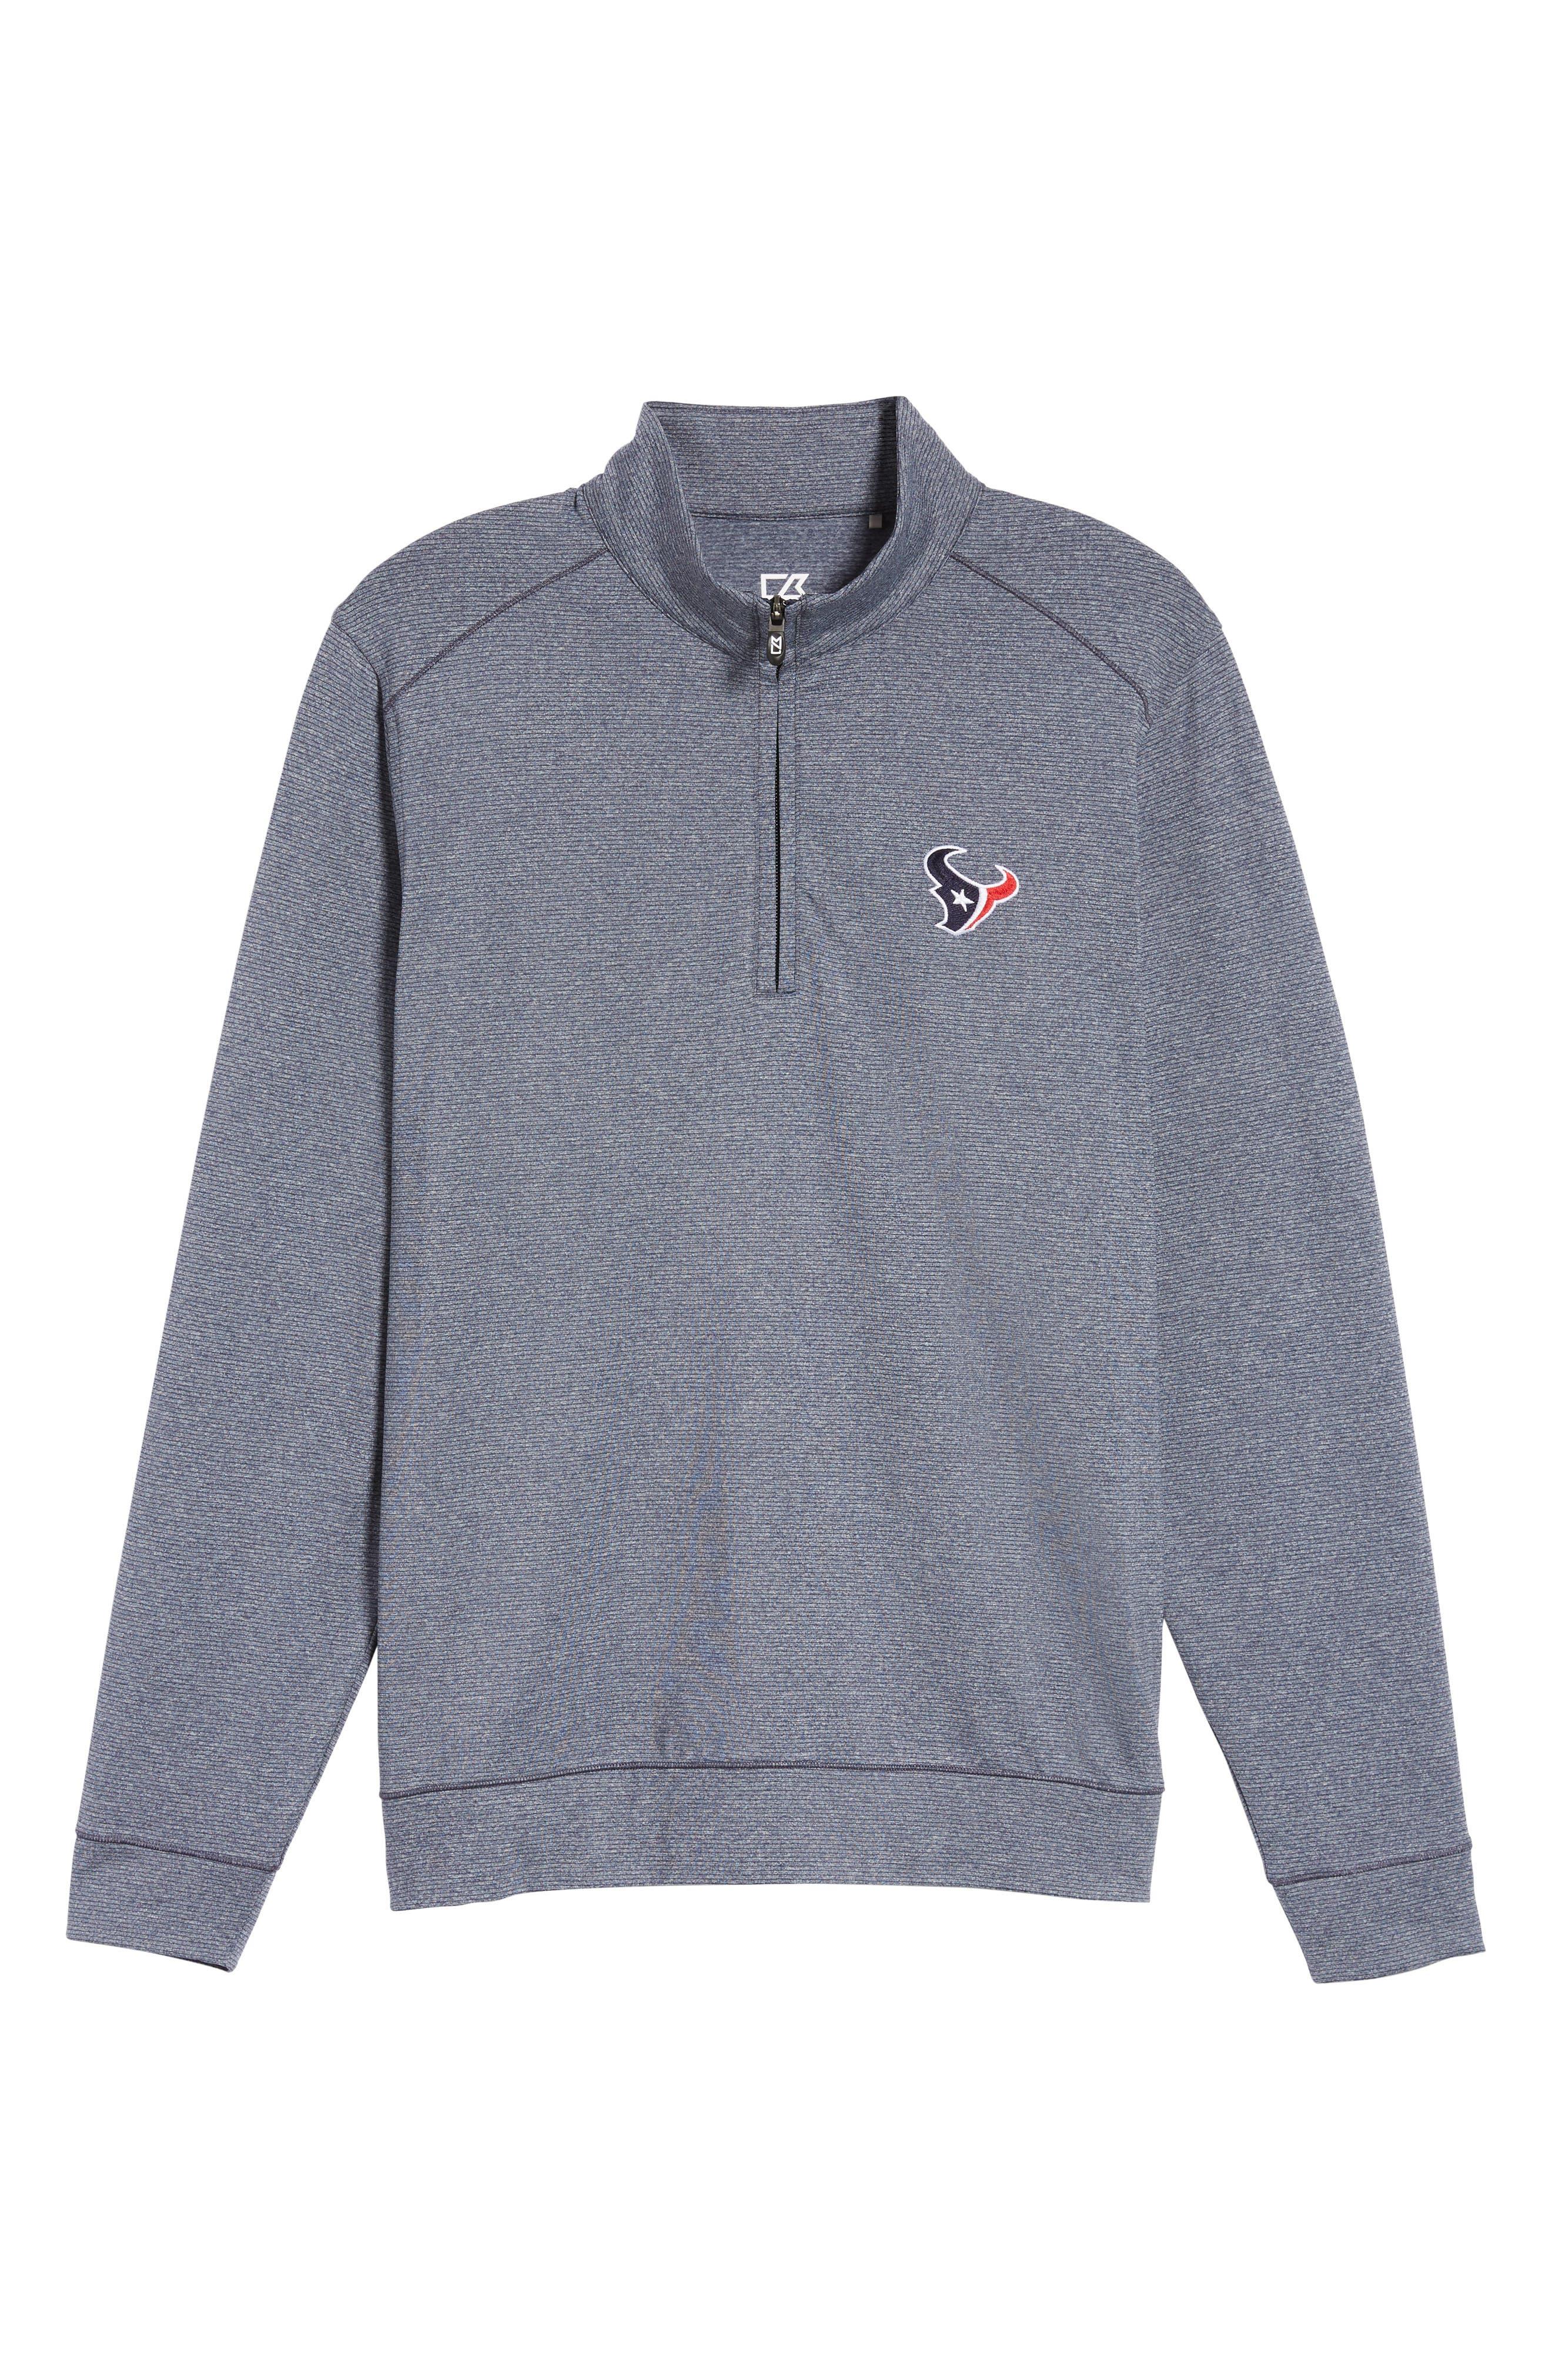 Shoreline - Houston Texans Half Zip Pullover,                             Alternate thumbnail 6, color,                             976